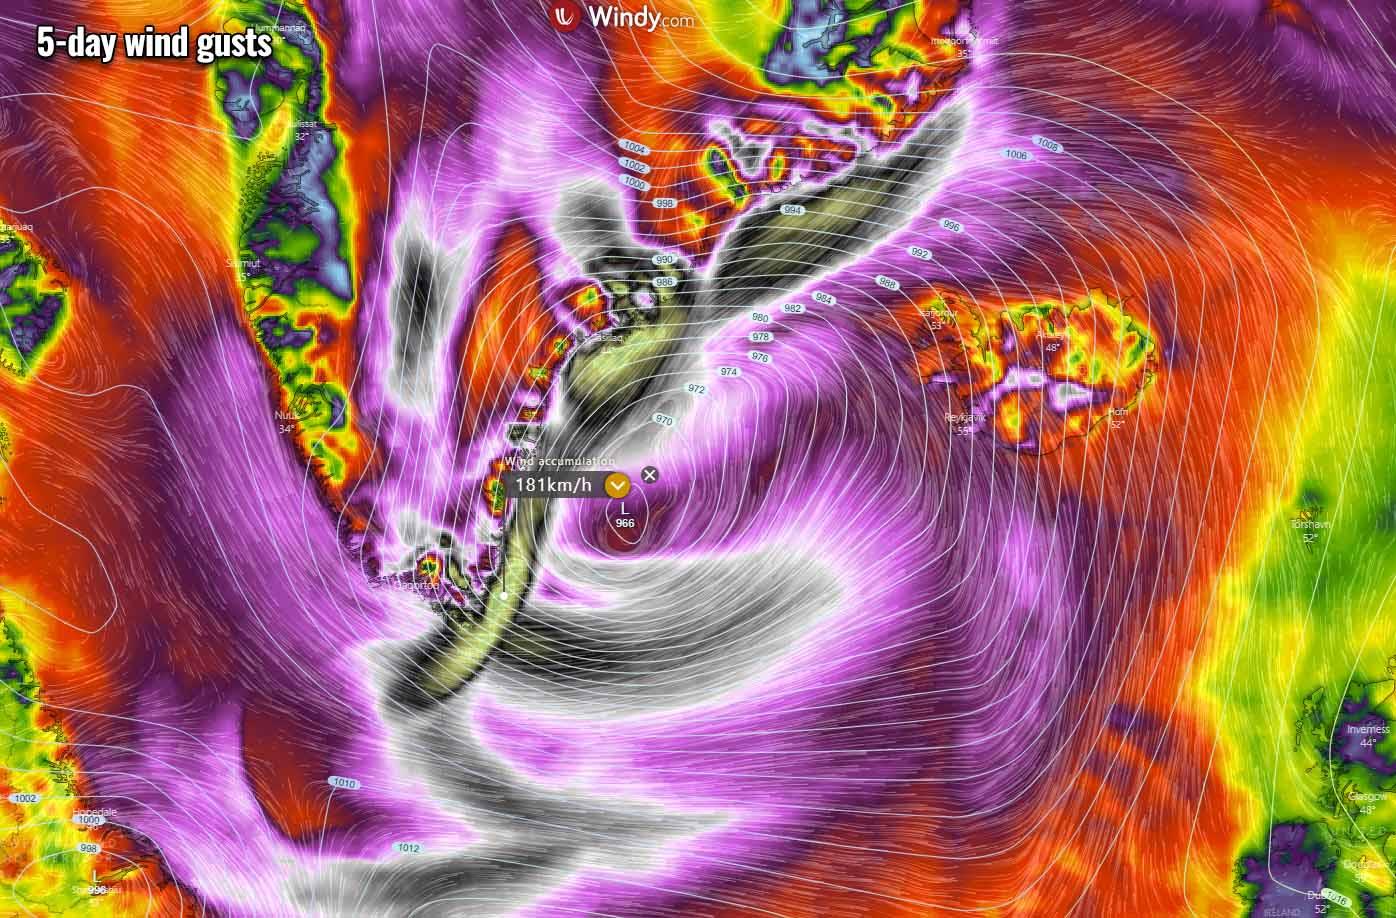 atlantic-hurricane-season-2021-larry-winter-storm-forecast-snow-greenland-winds